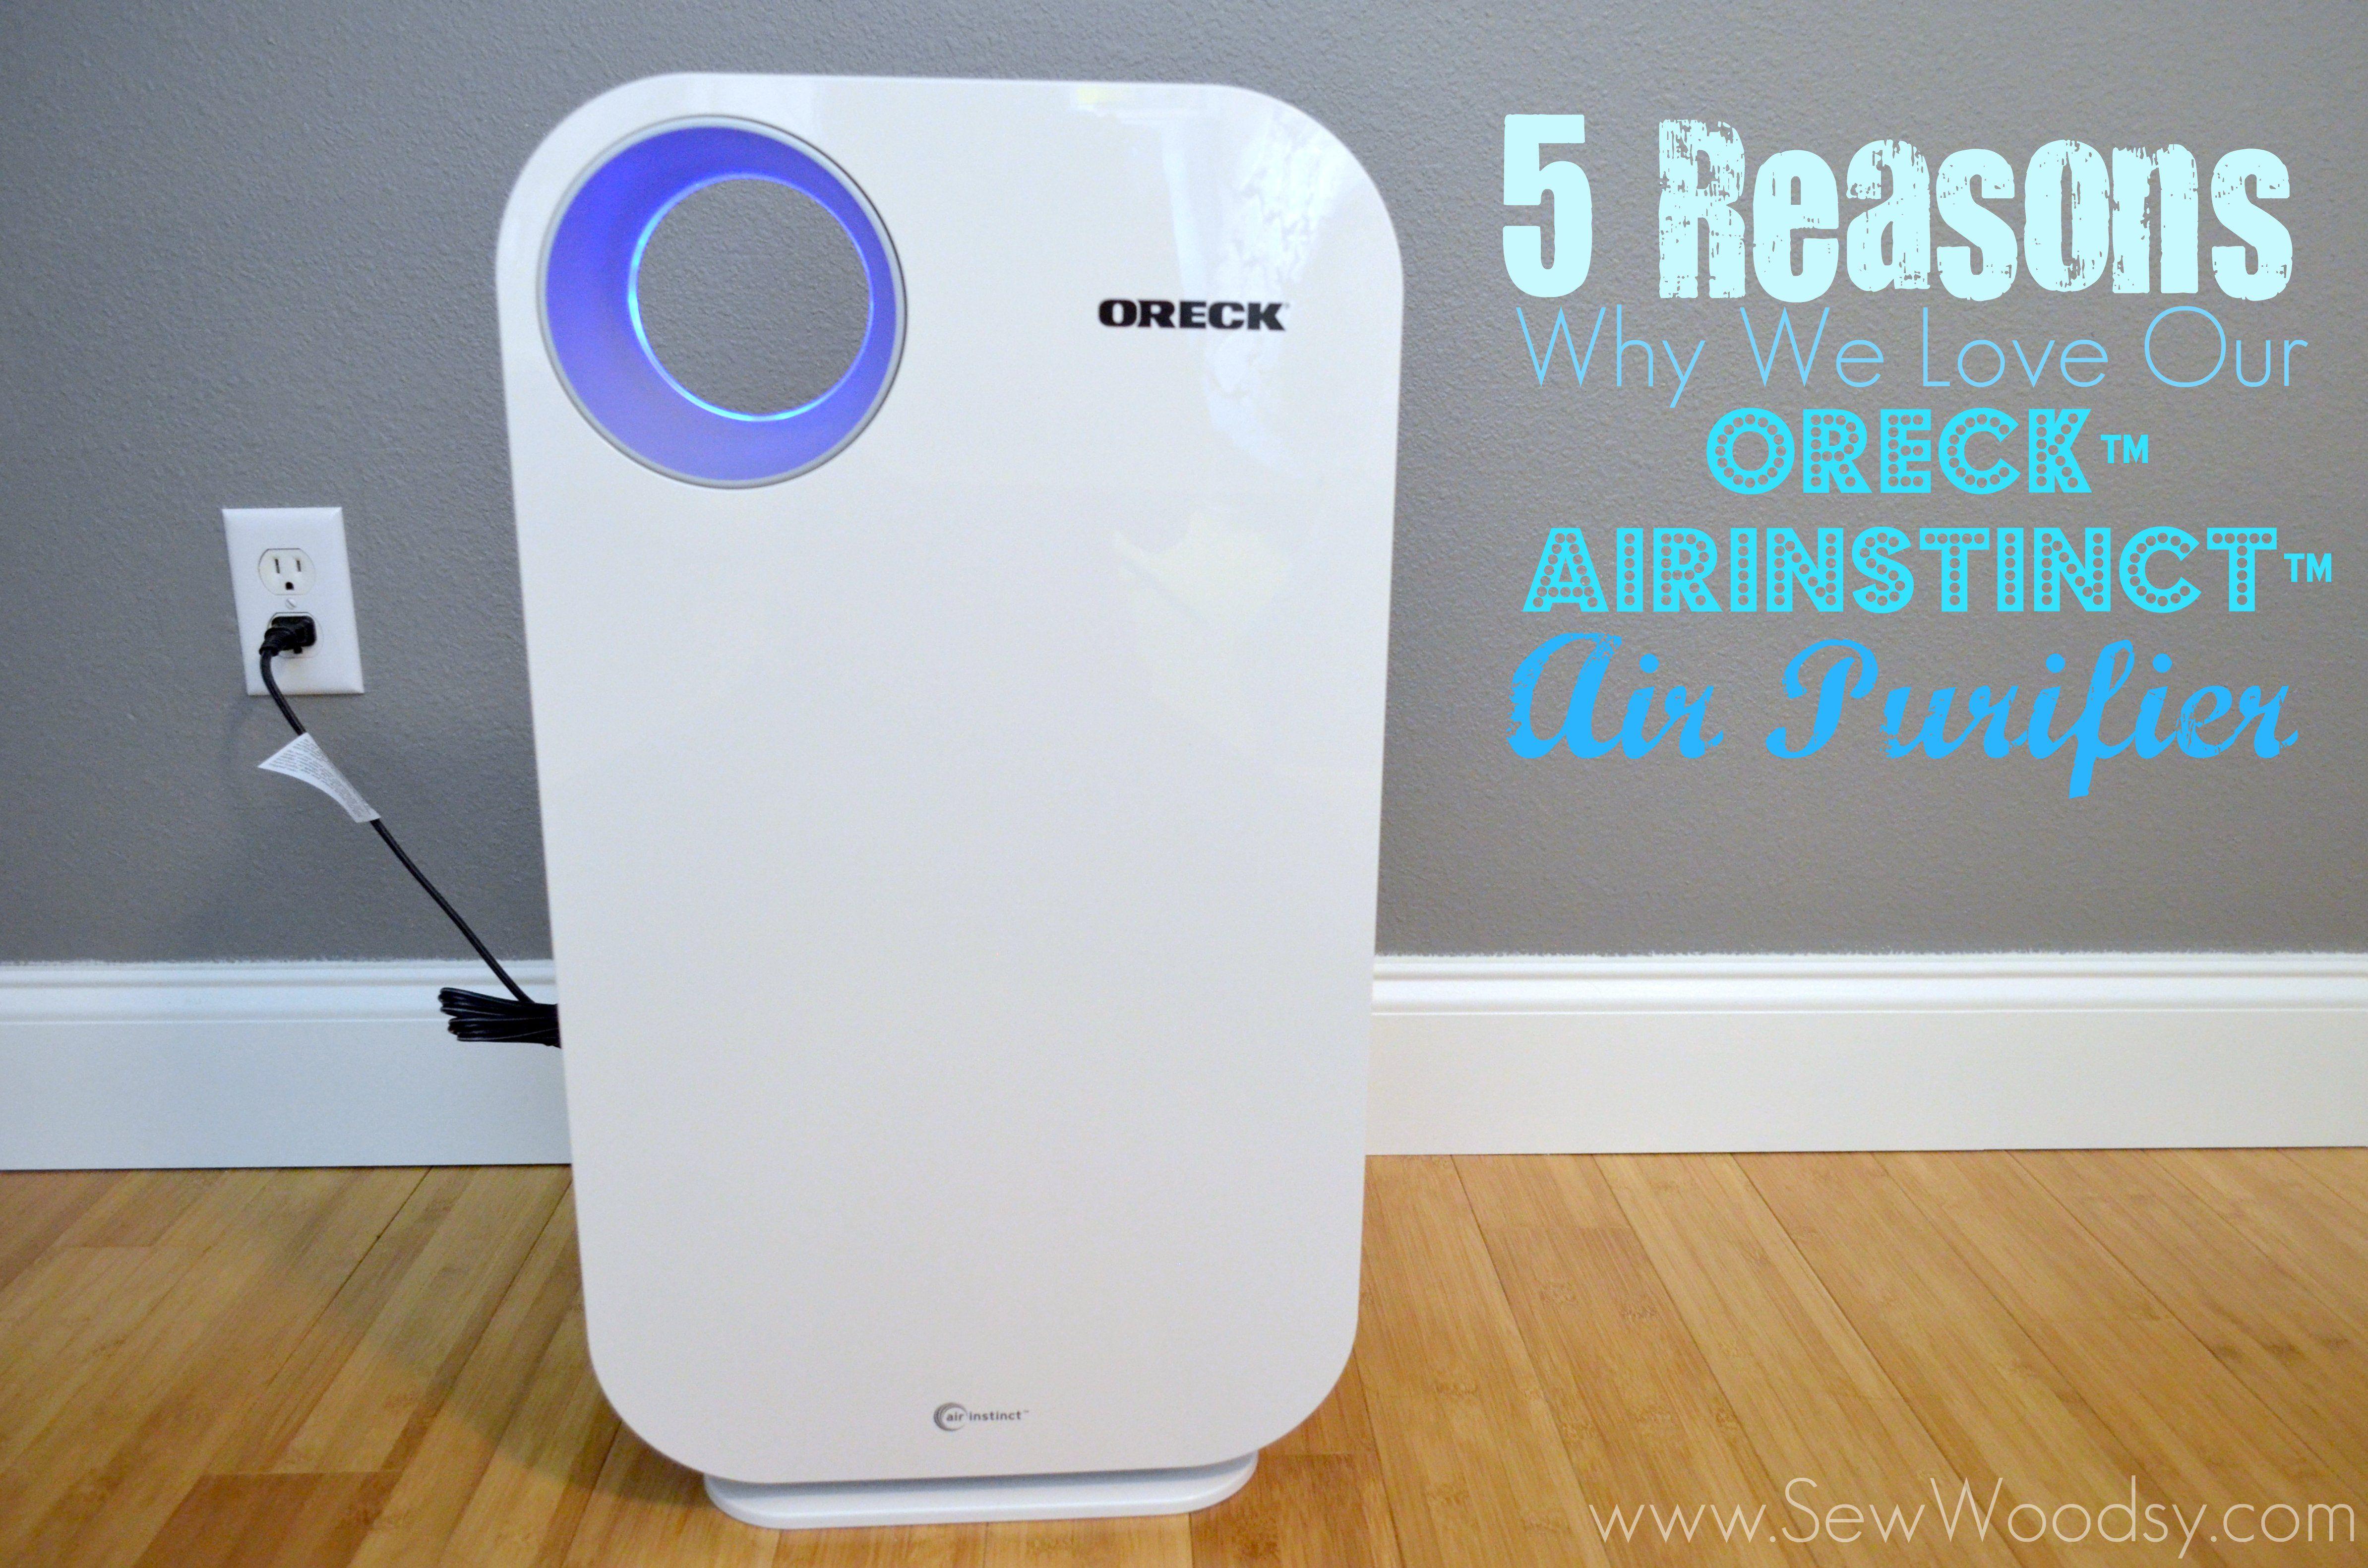 Oreck AirInstinct Air Purifier Air purifier, Oreck, Giveaway